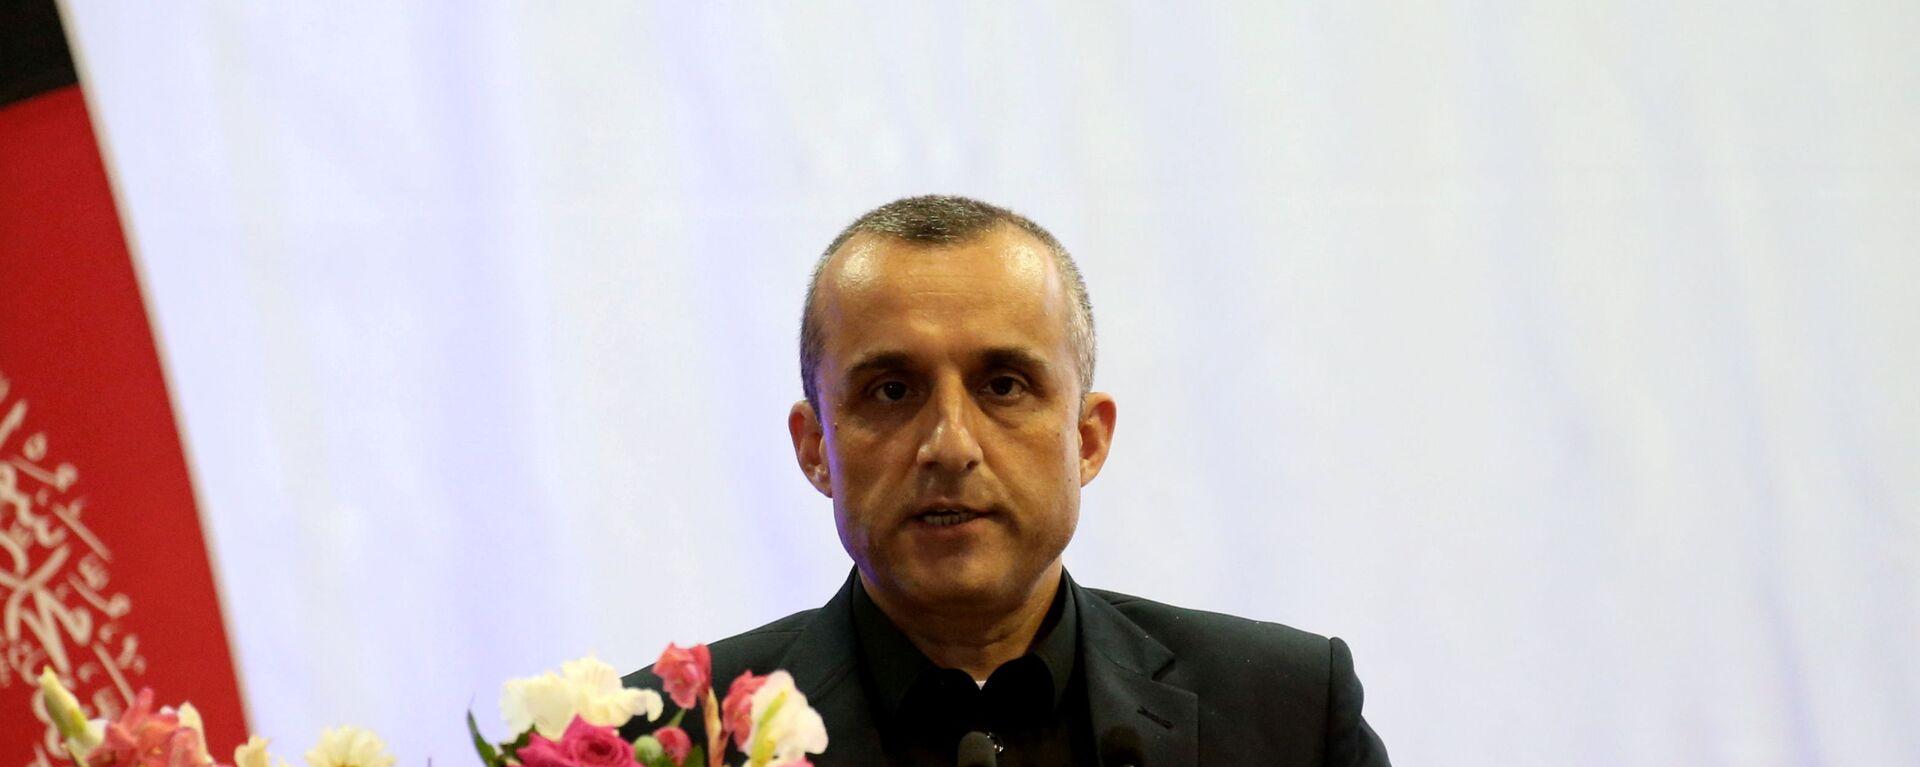 AmFILE PHOTO: Amrullah Saleh first vice-presidential candidate of Ashraf Ghani speaks during the presidential election campaign in Kabul,  Afghanistan, 13 September 2019. REUTERS/Omar Sobhani/File Photo - Sputnik International, 1920, 27.08.2021